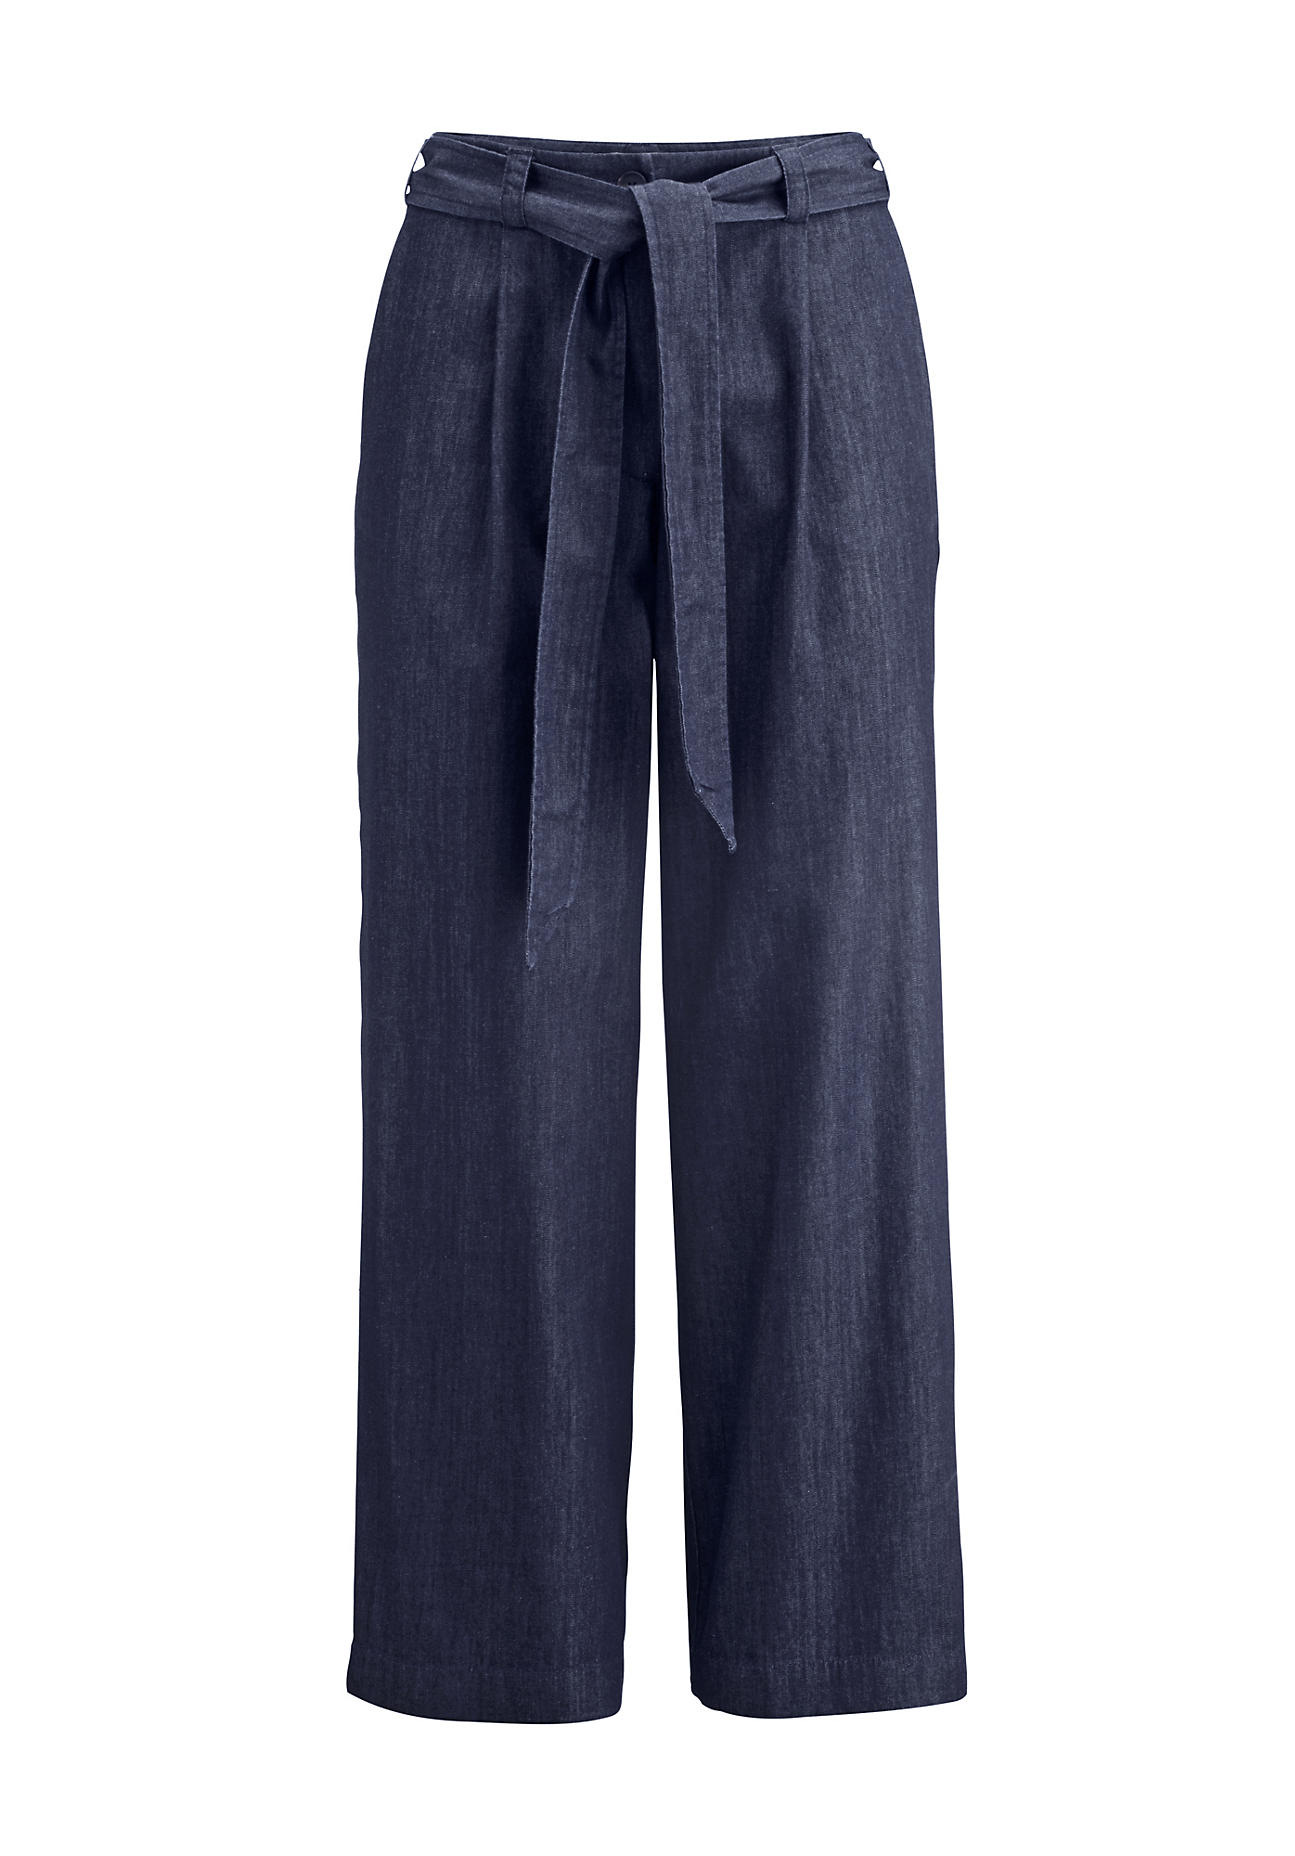 Hosen - hessnatur Damen Jeans Culotte – blau –  - Onlineshop Hessnatur